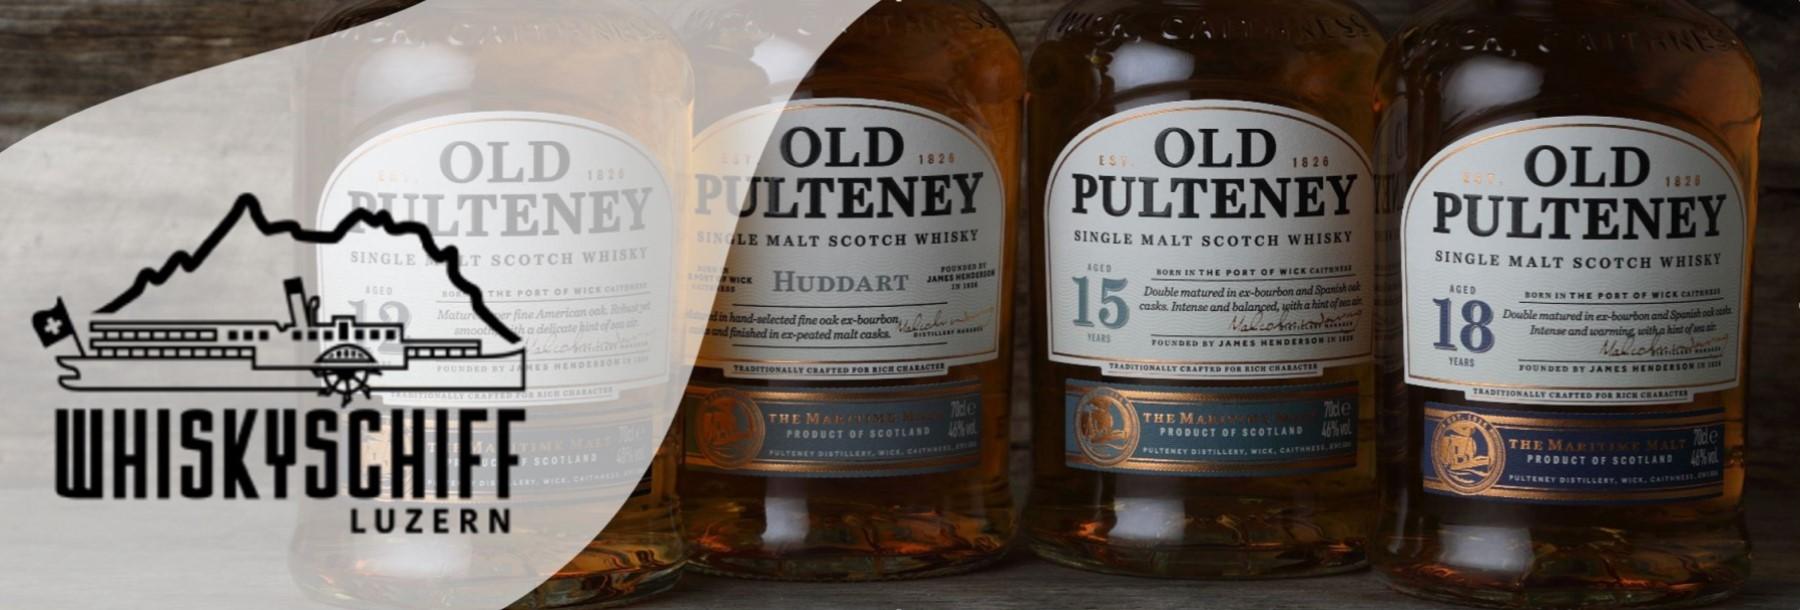 Whiskyschiff Luzern Old Pulteney Inverhouse Single Malts neue Glen Fahrn